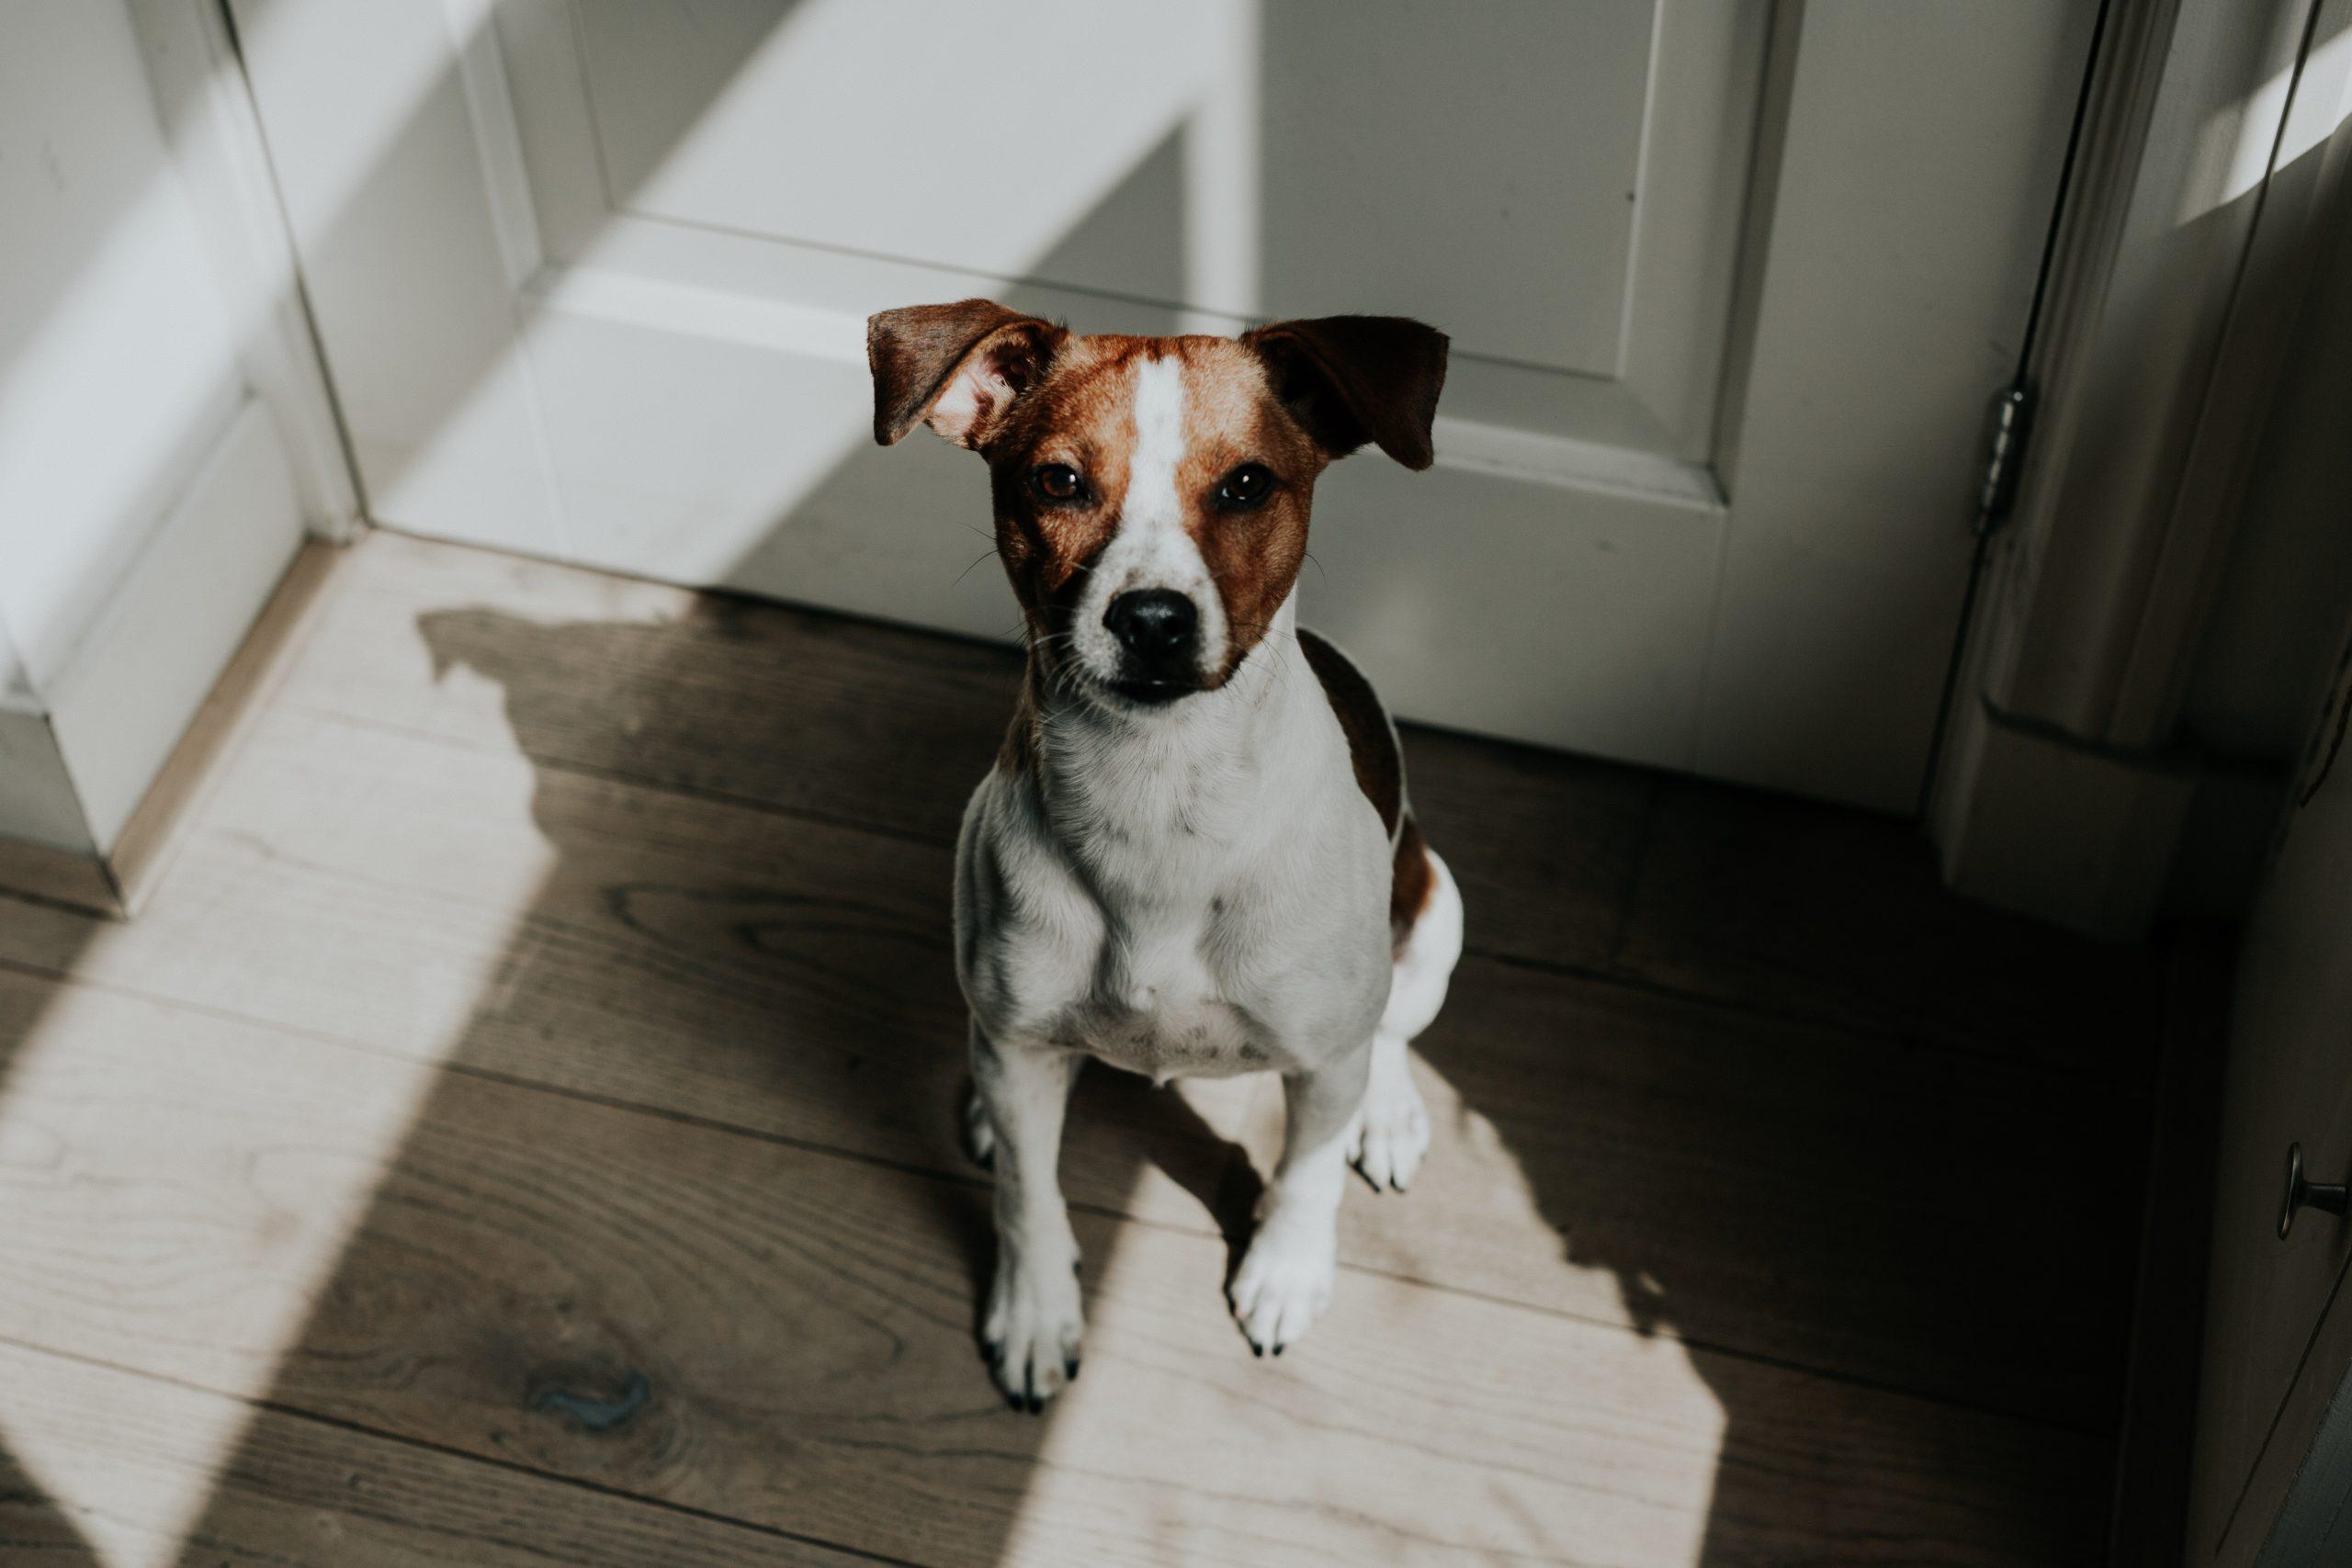 Small dog sitting on wood floor